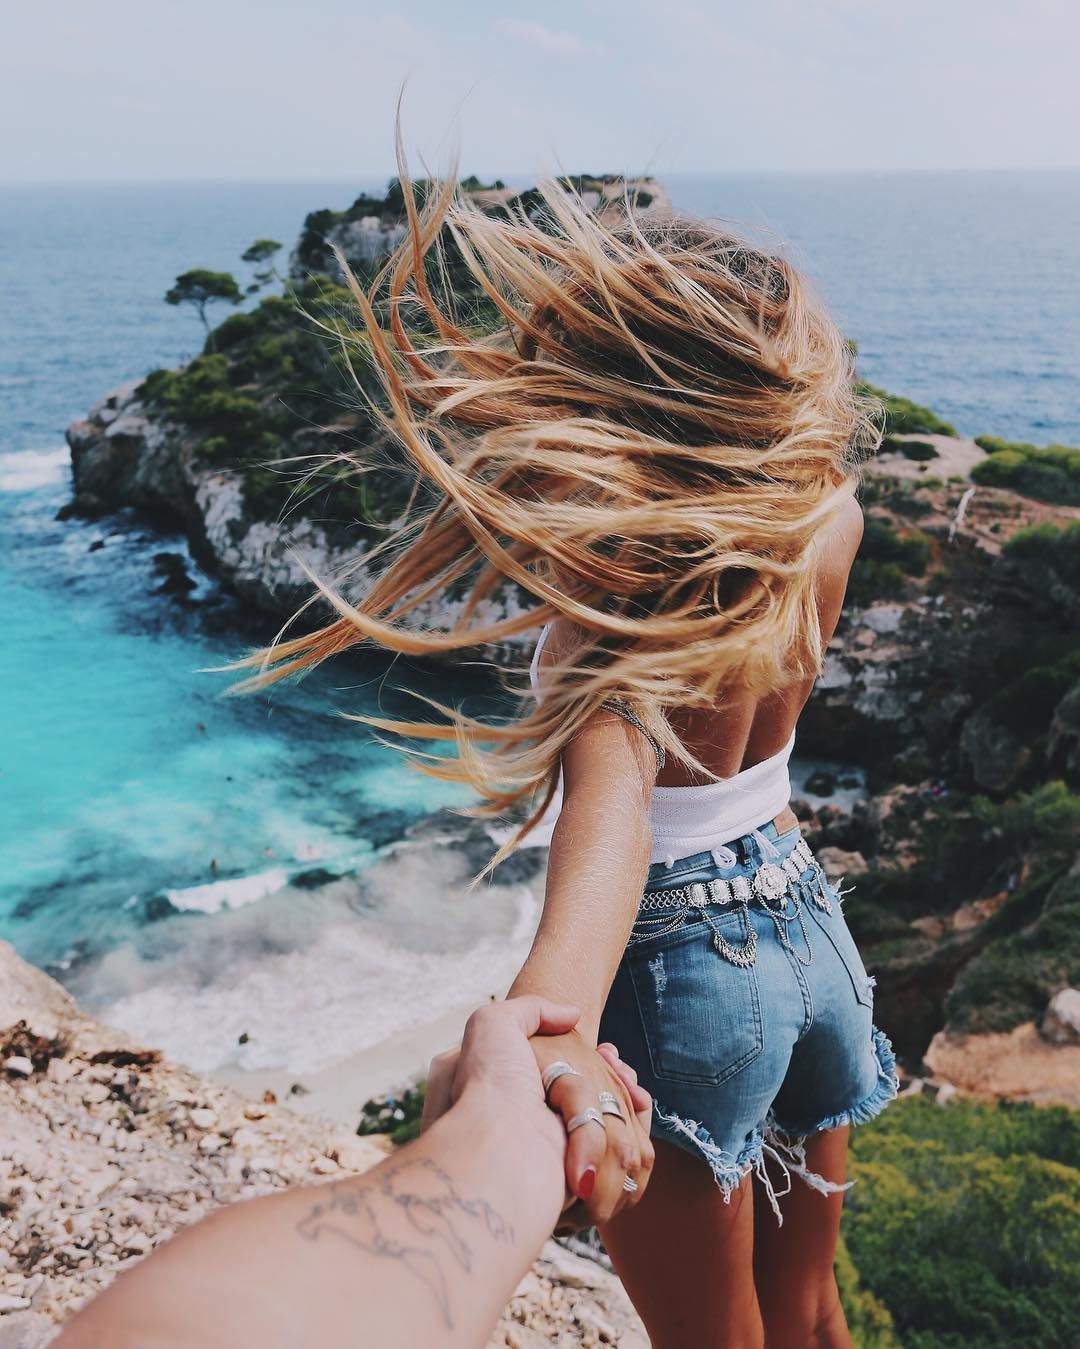 Urlaubsfotos Ideen schönes urlaubsfoto ideen urlaubsfotos ideen